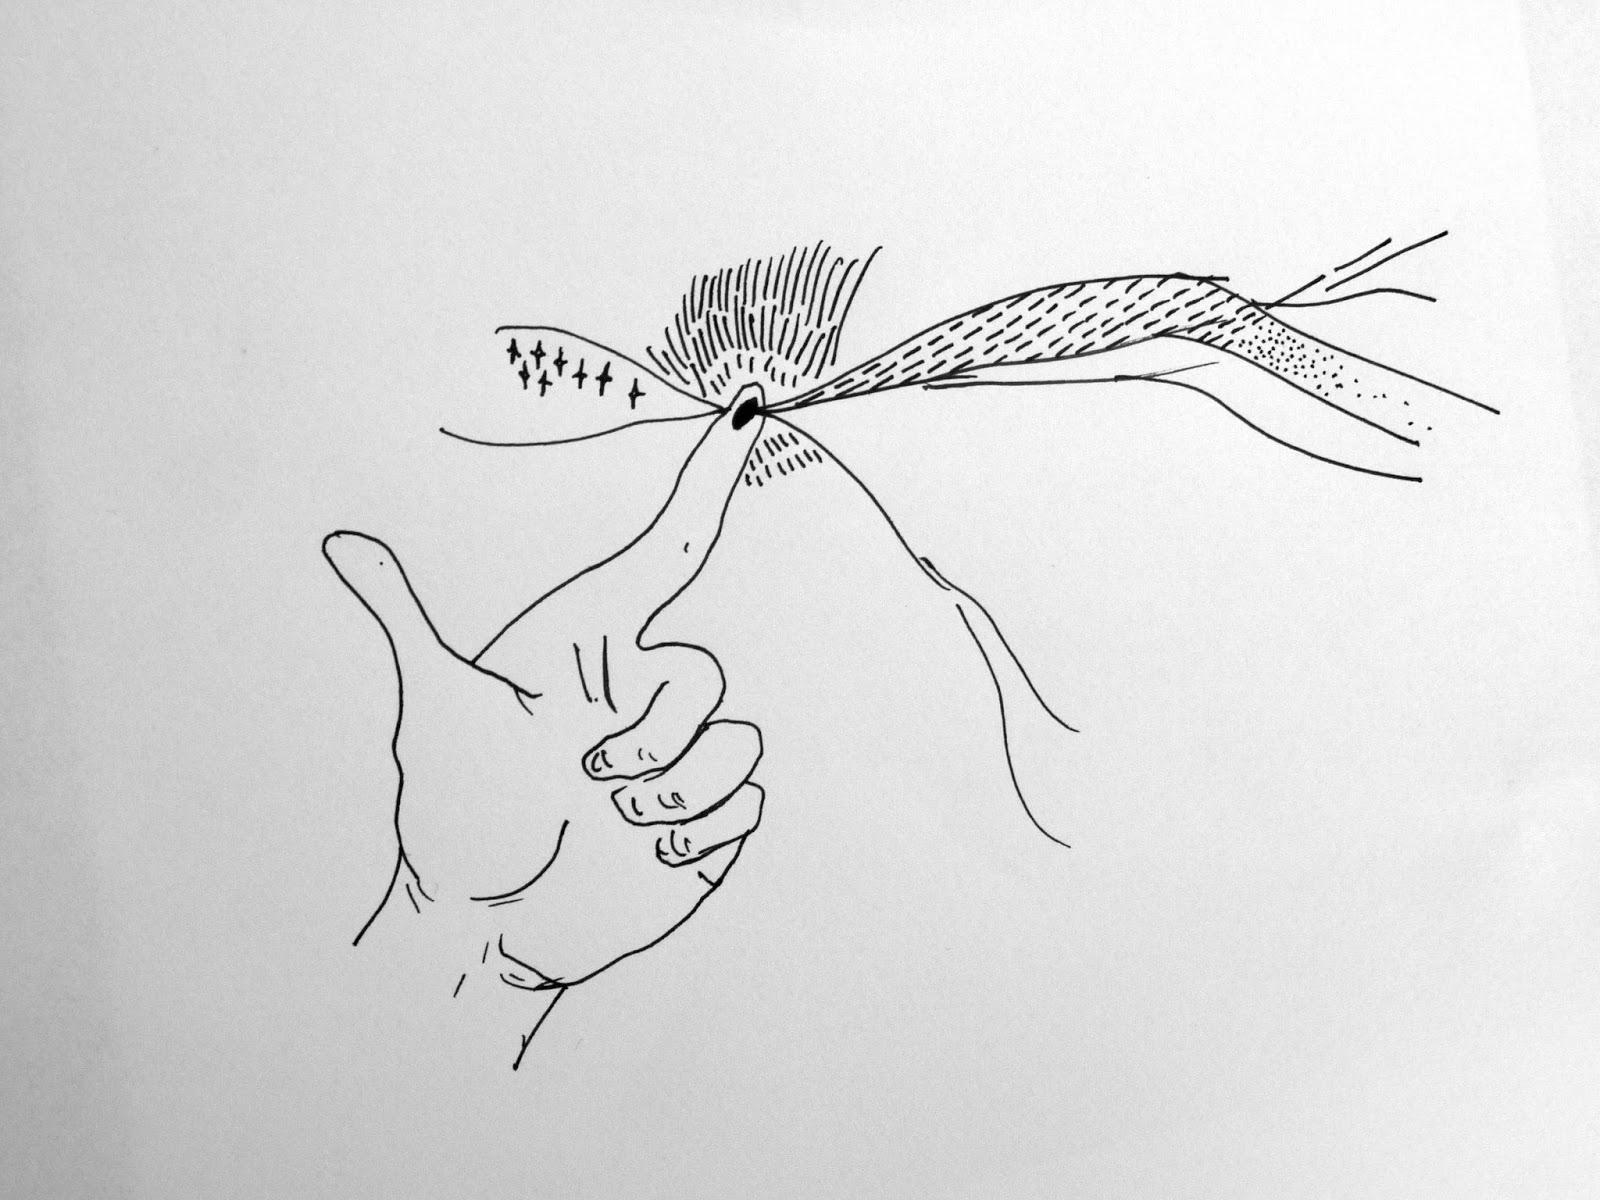 Untitled (Magic Finger)